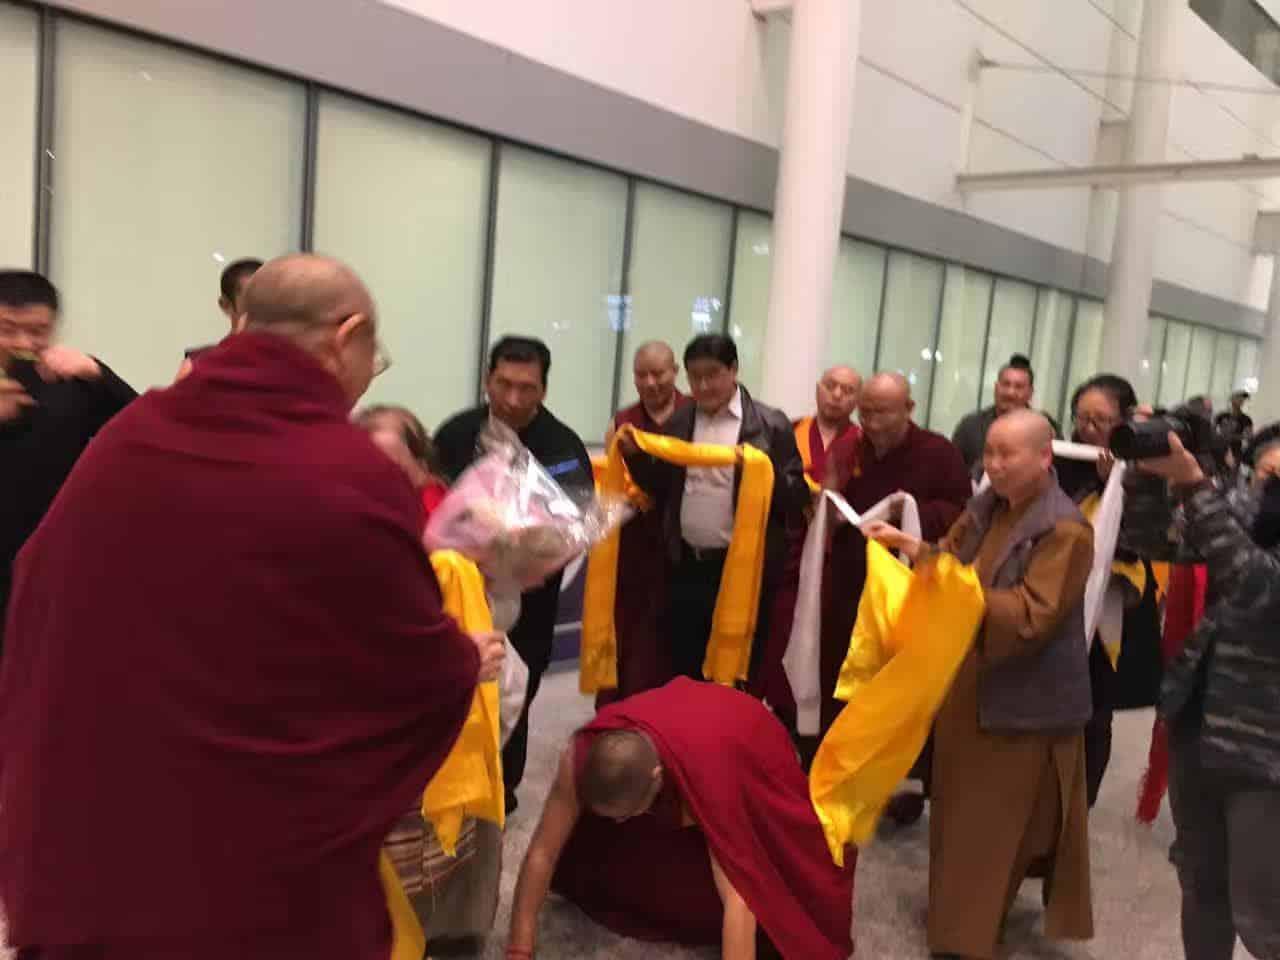 Gosok Rinpoche Toronto 2017-04 000 f1196b985c21c64bfd74432128039d2